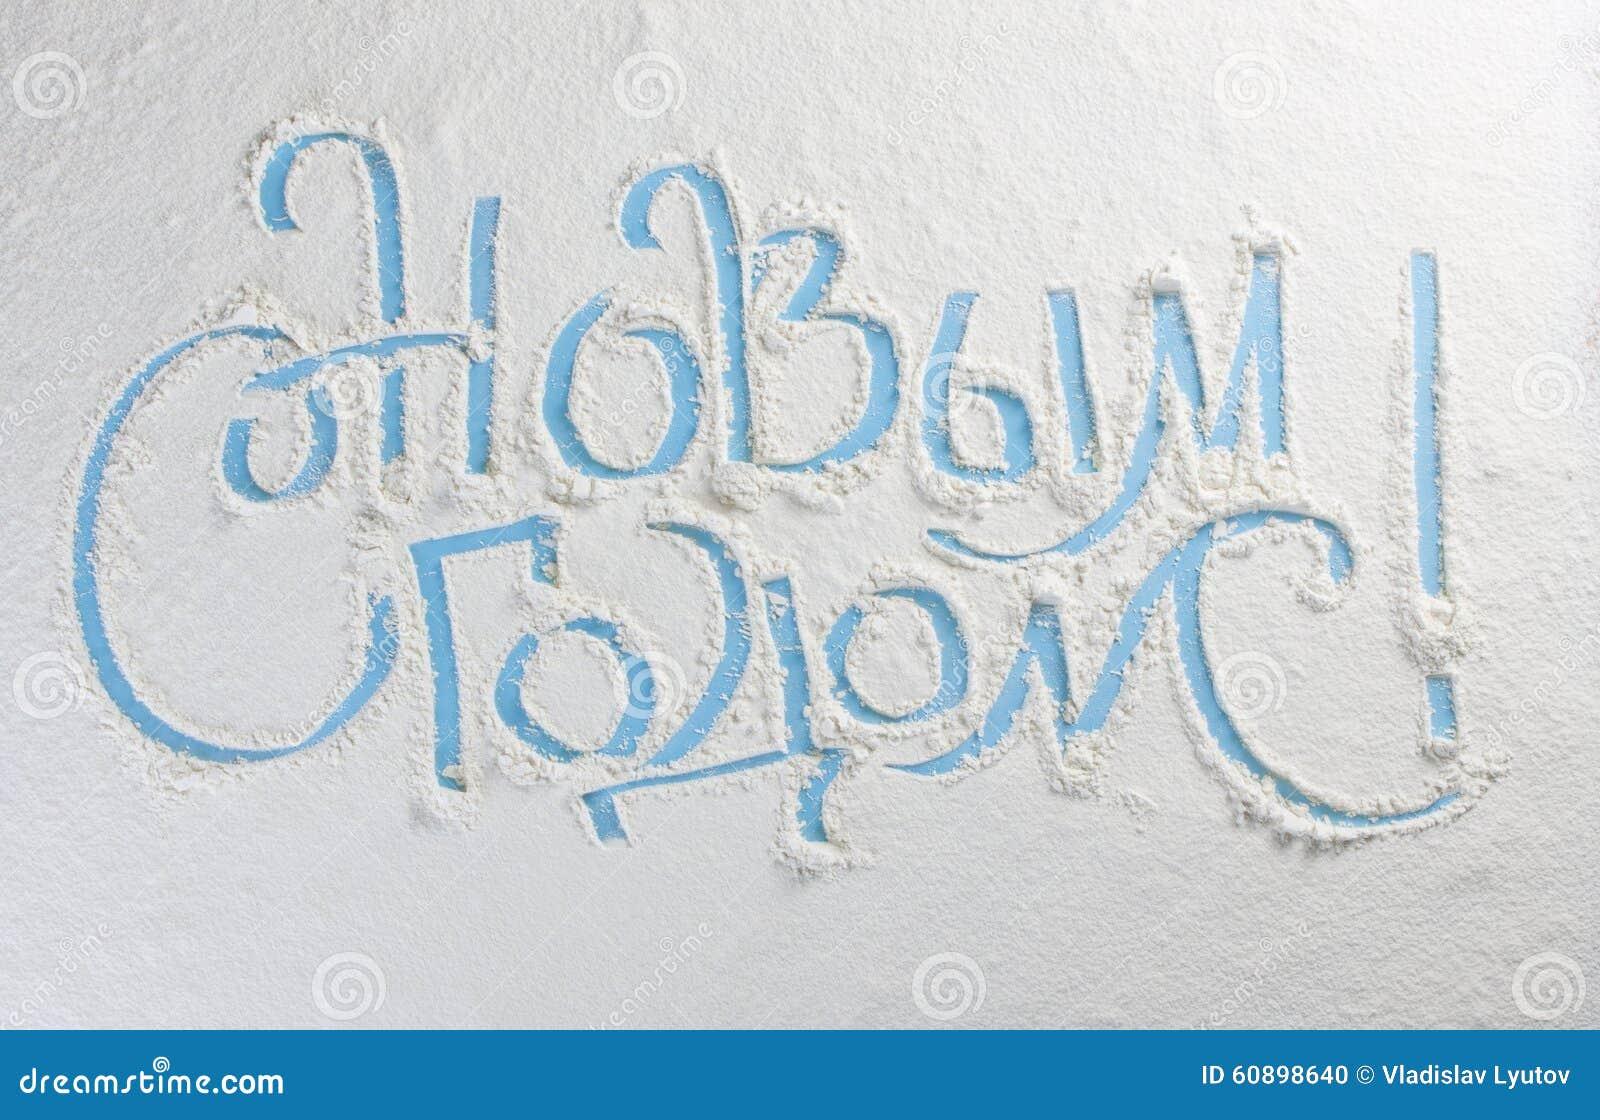 guten rutsch ins neue jahrbeschriftung russisch frohe. Black Bedroom Furniture Sets. Home Design Ideas